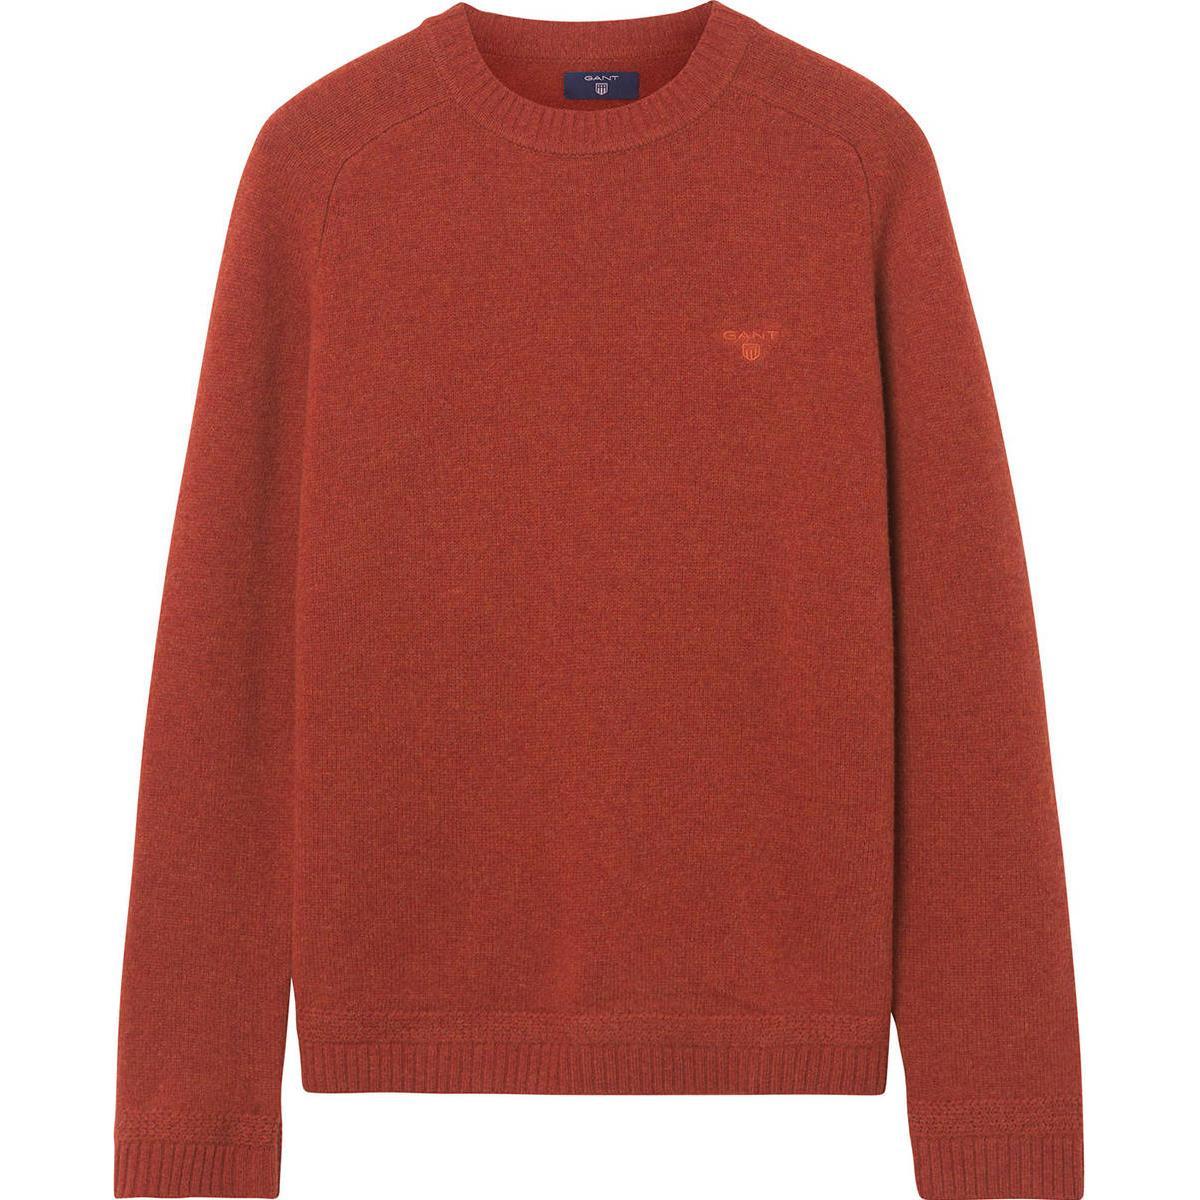 8a3947e99faa Sweater Herretøj - Sammenlign priser hos PriceRunner